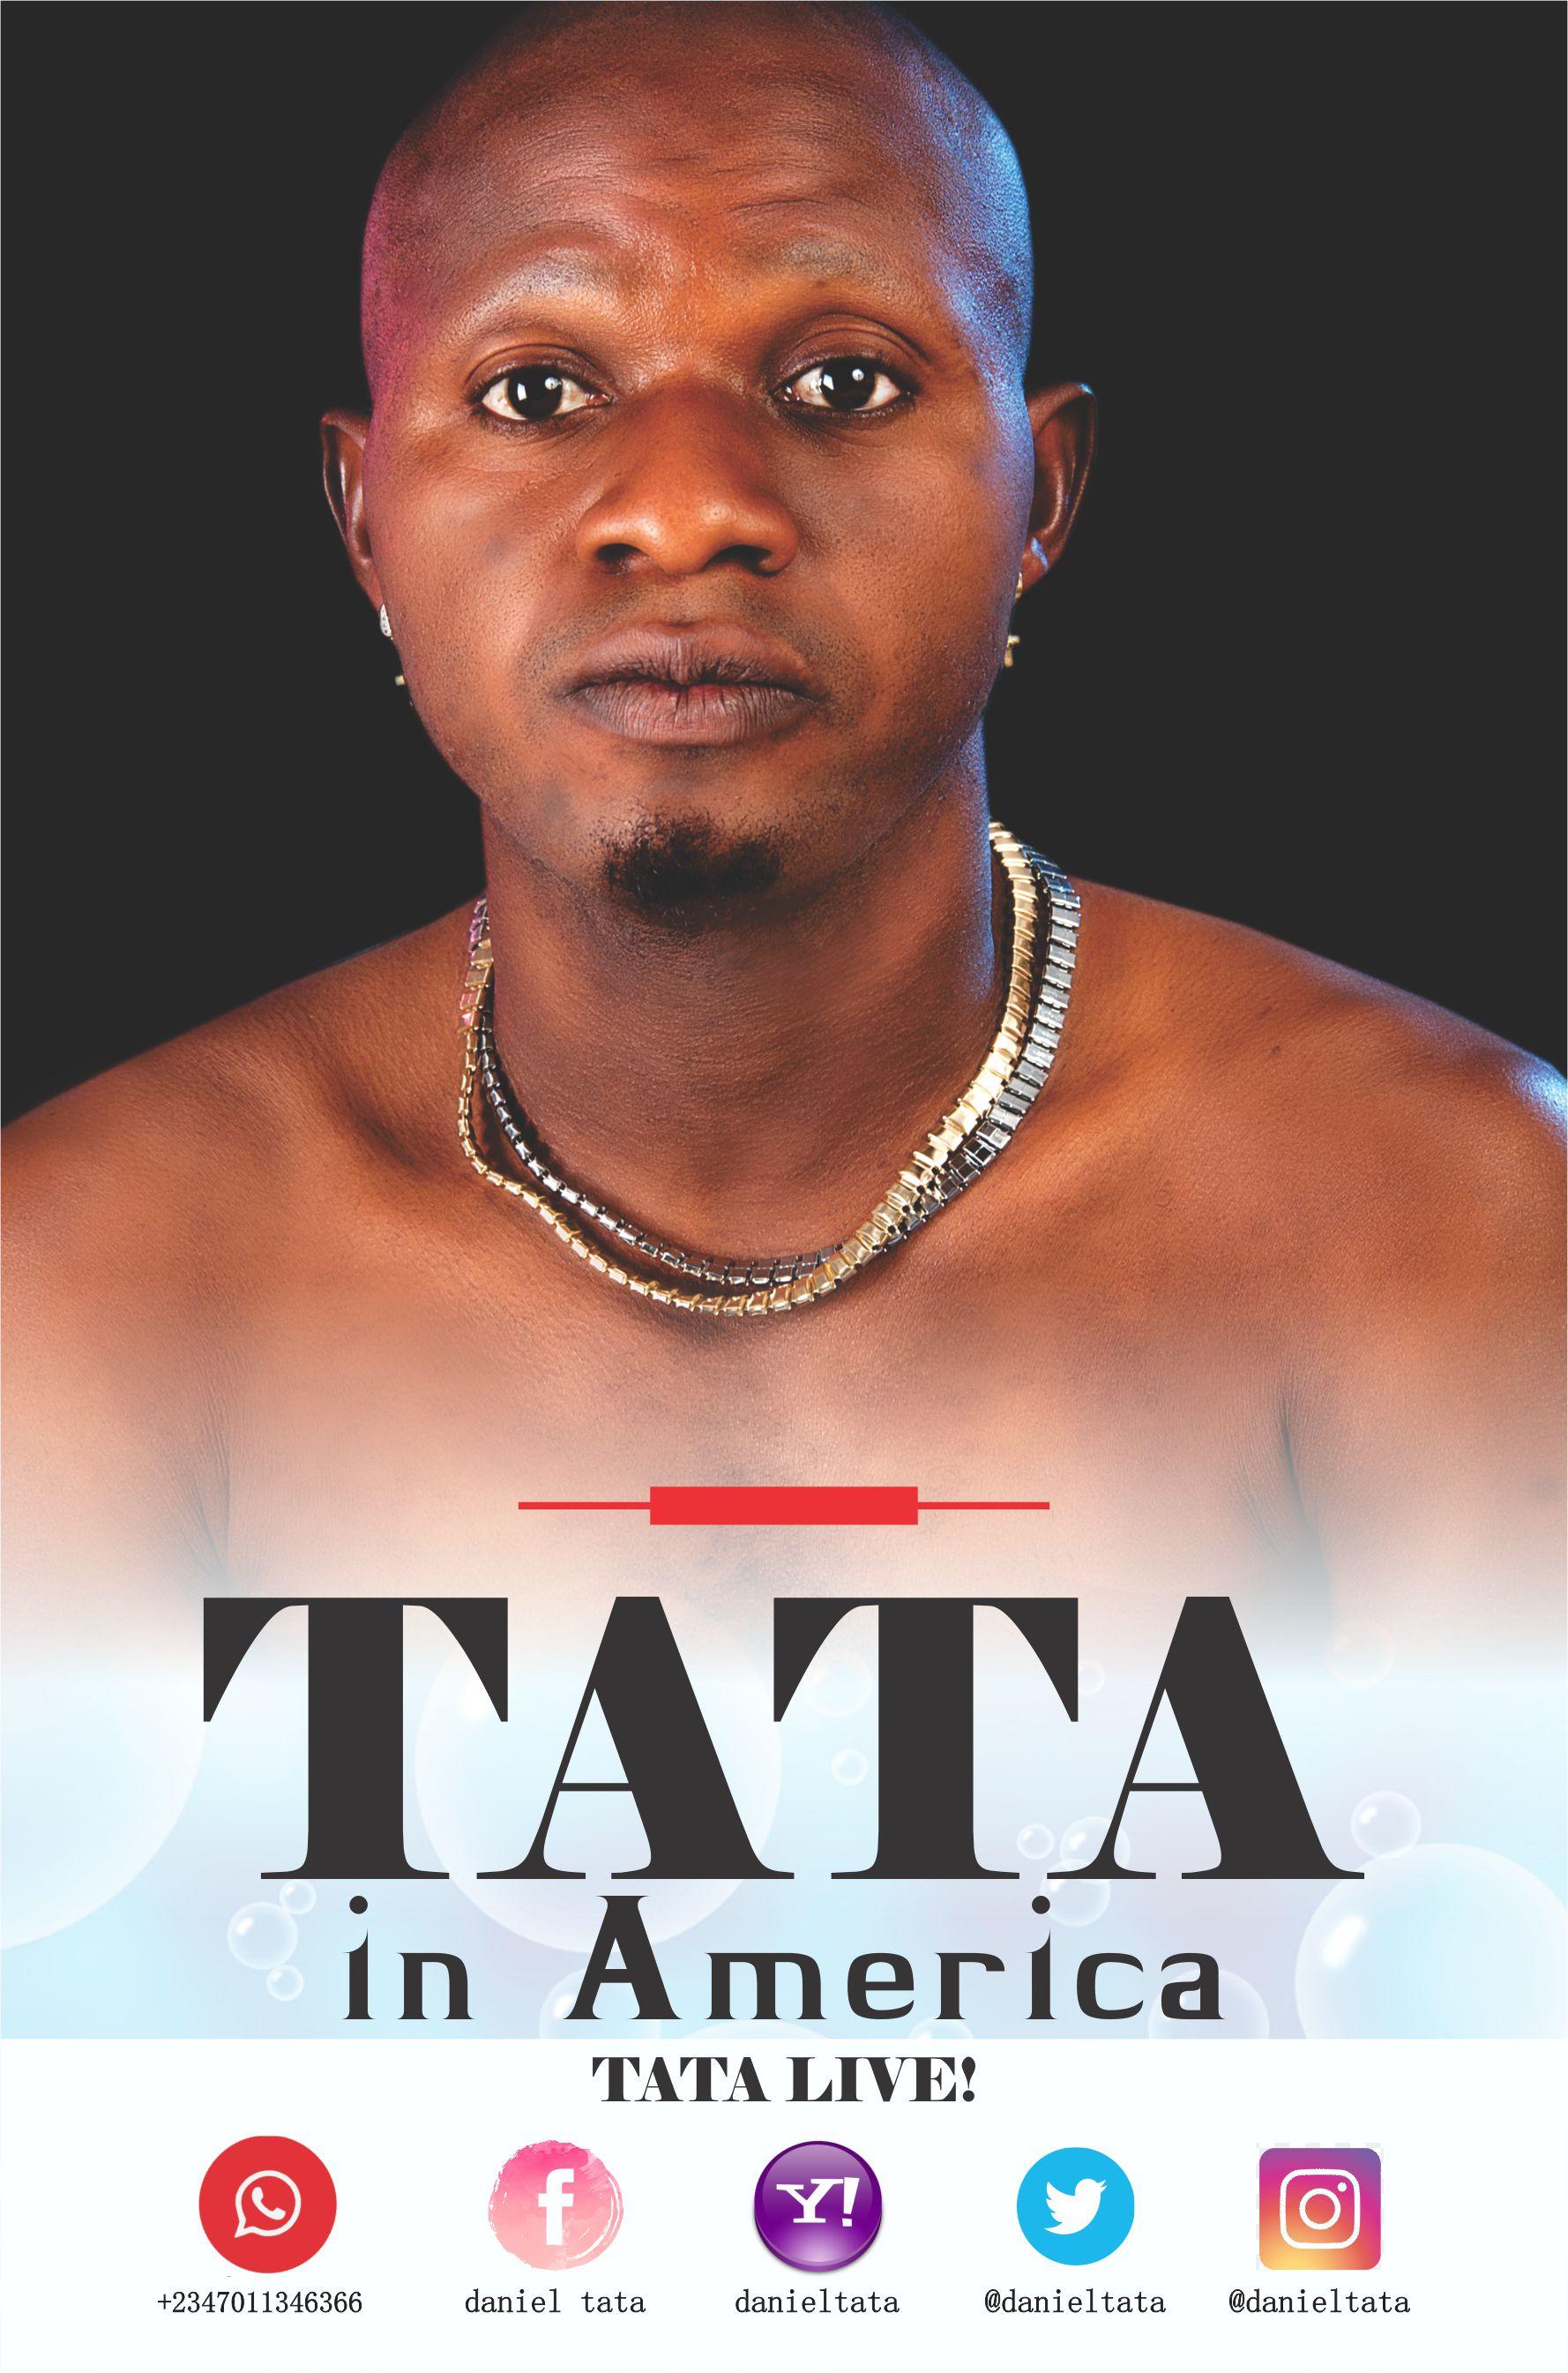 Tata - Tata in America (Prod. By Mickenzy)